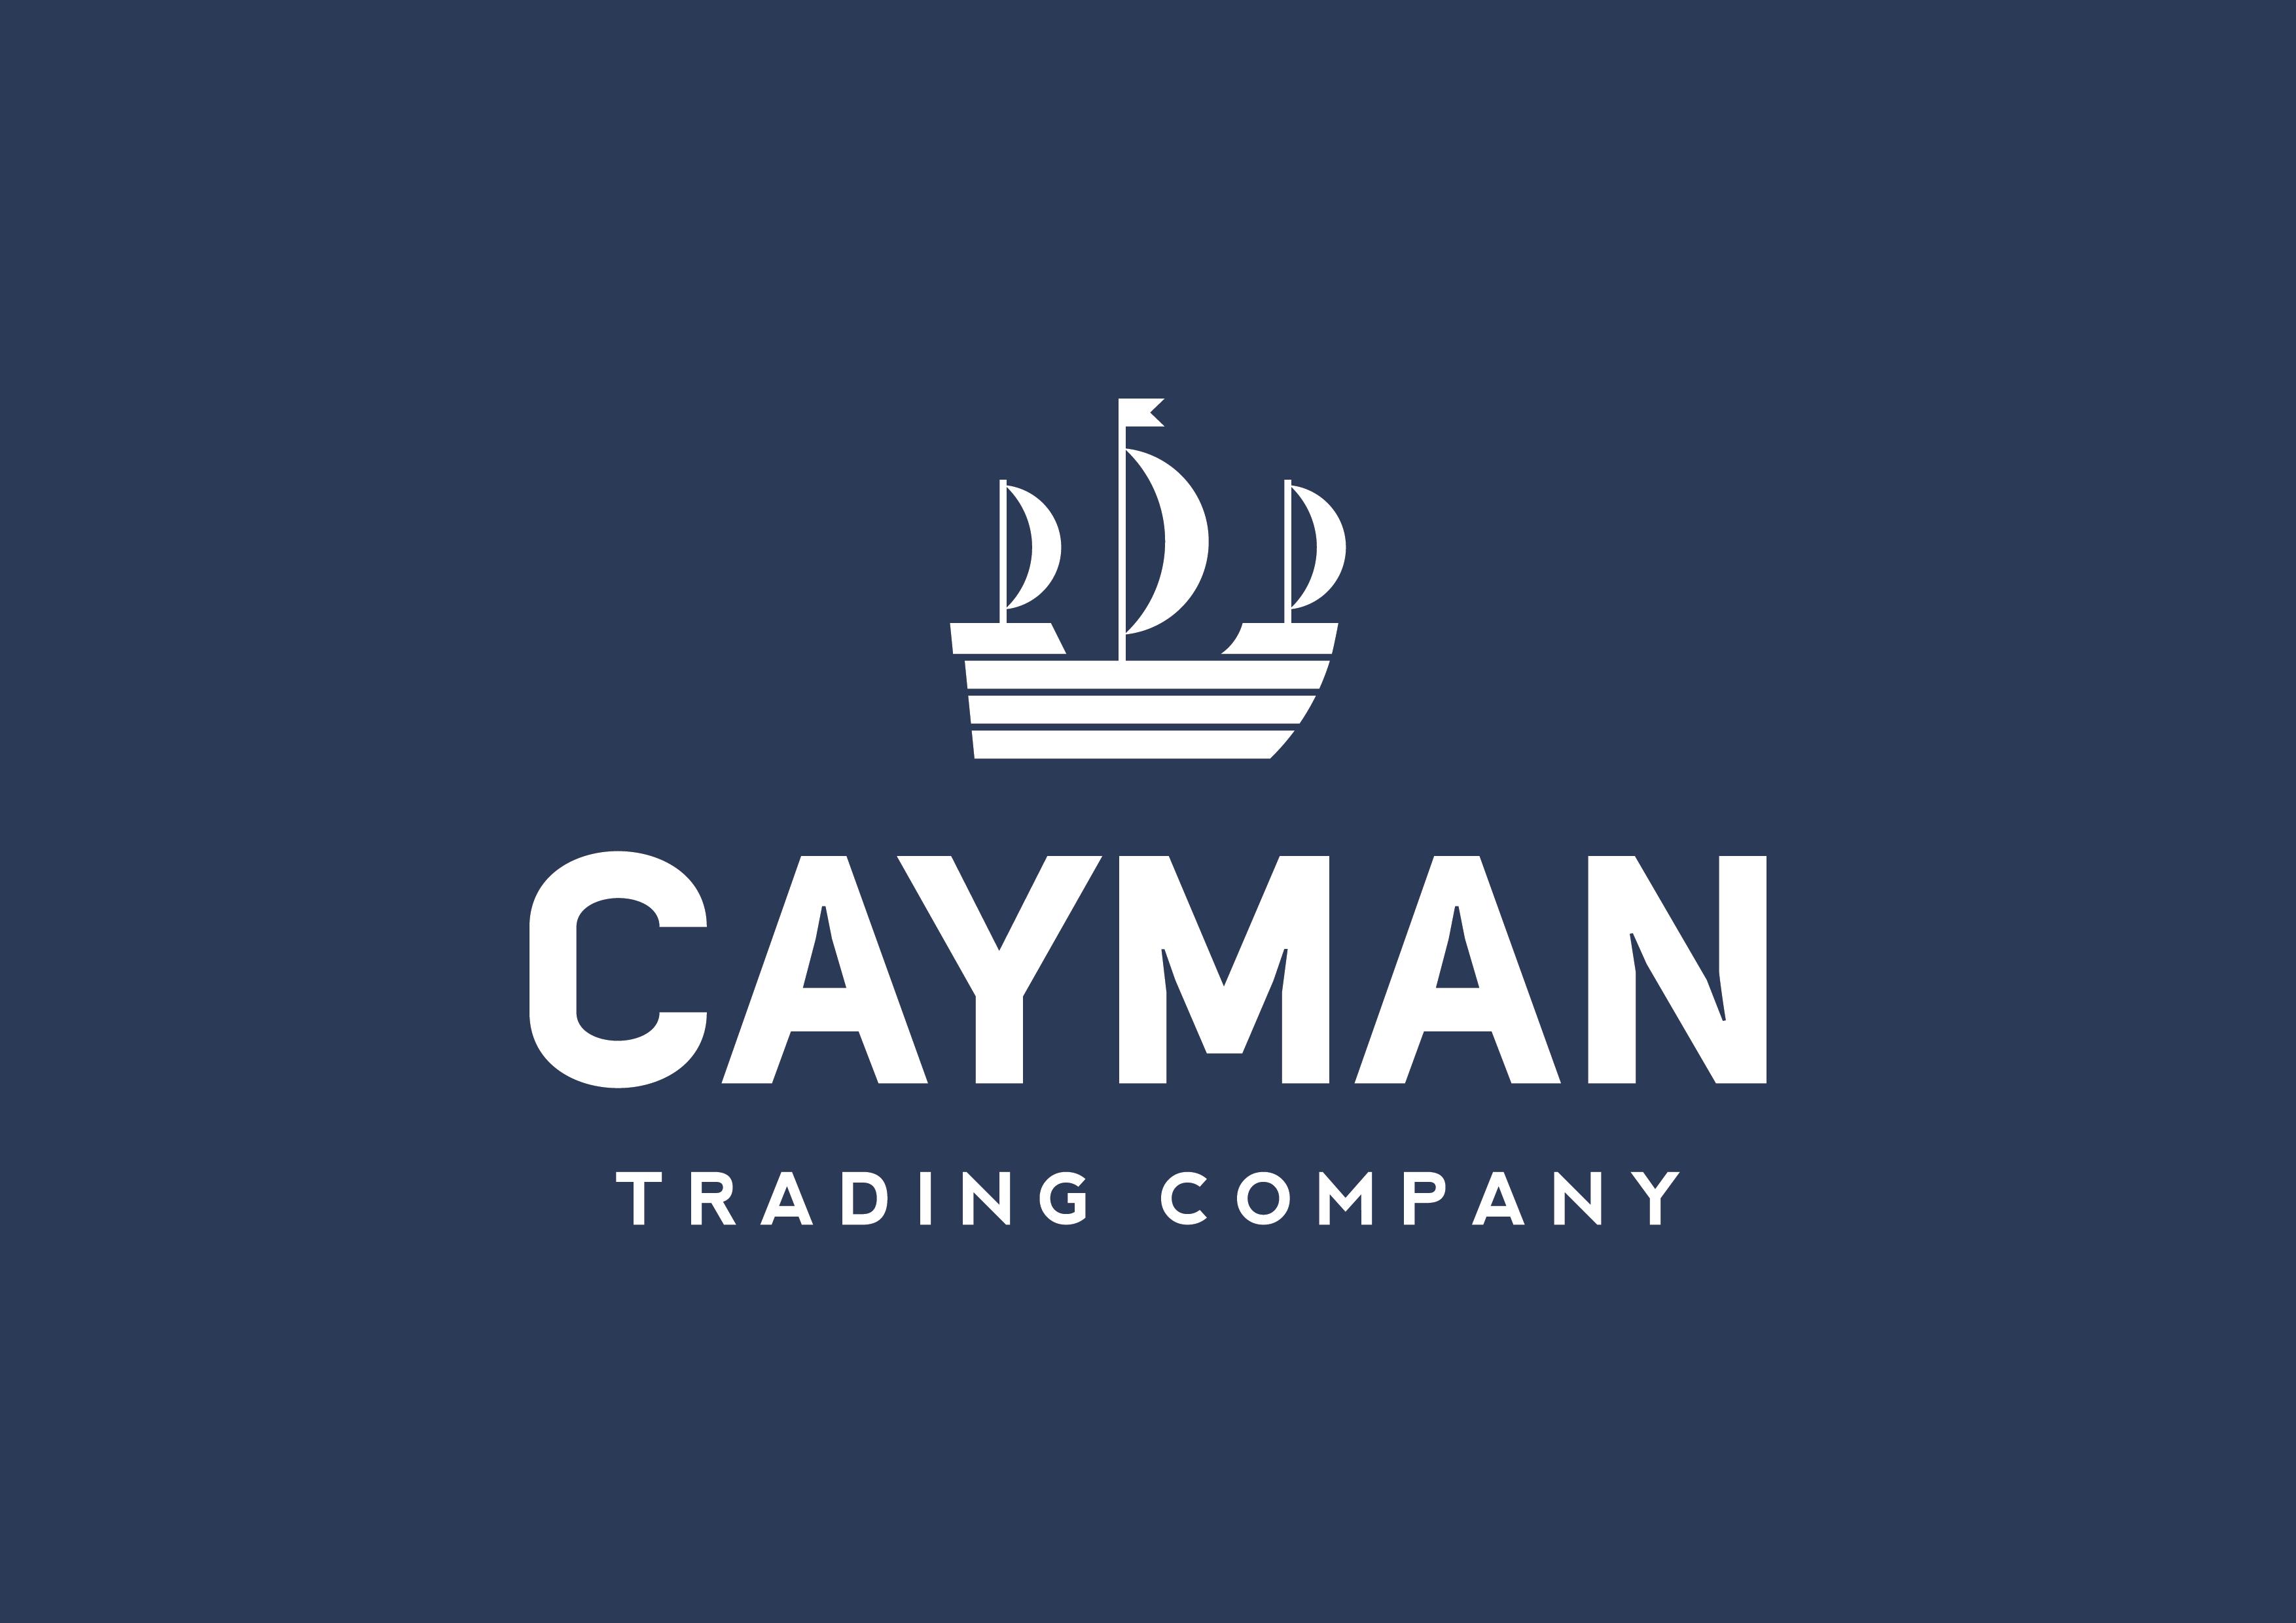 Cayman Trading Company in need of logo!